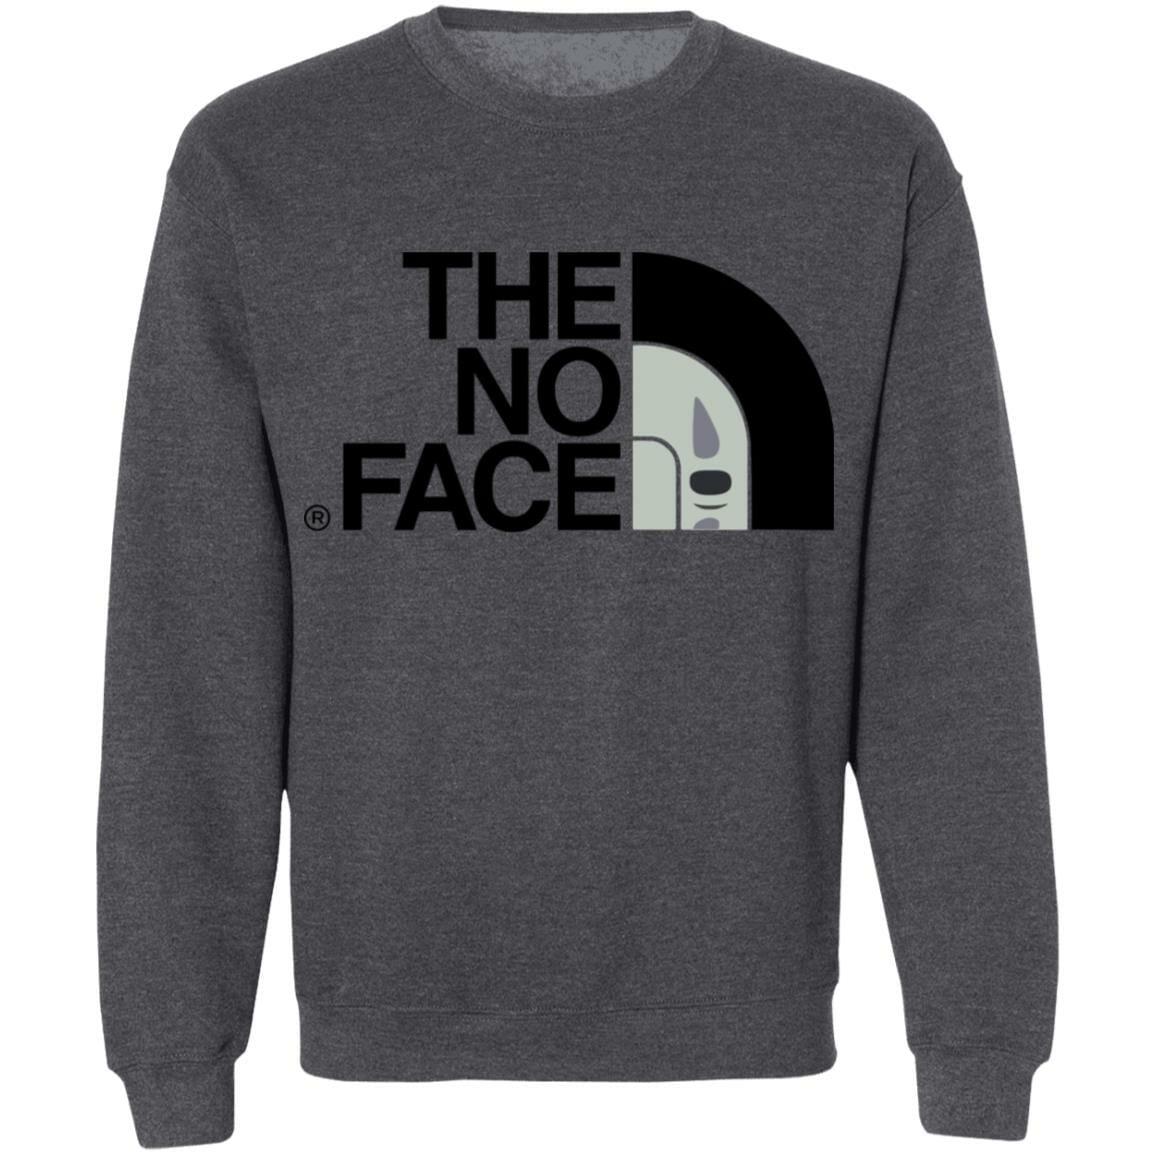 Spirited Away – The No Face Sweatshirt